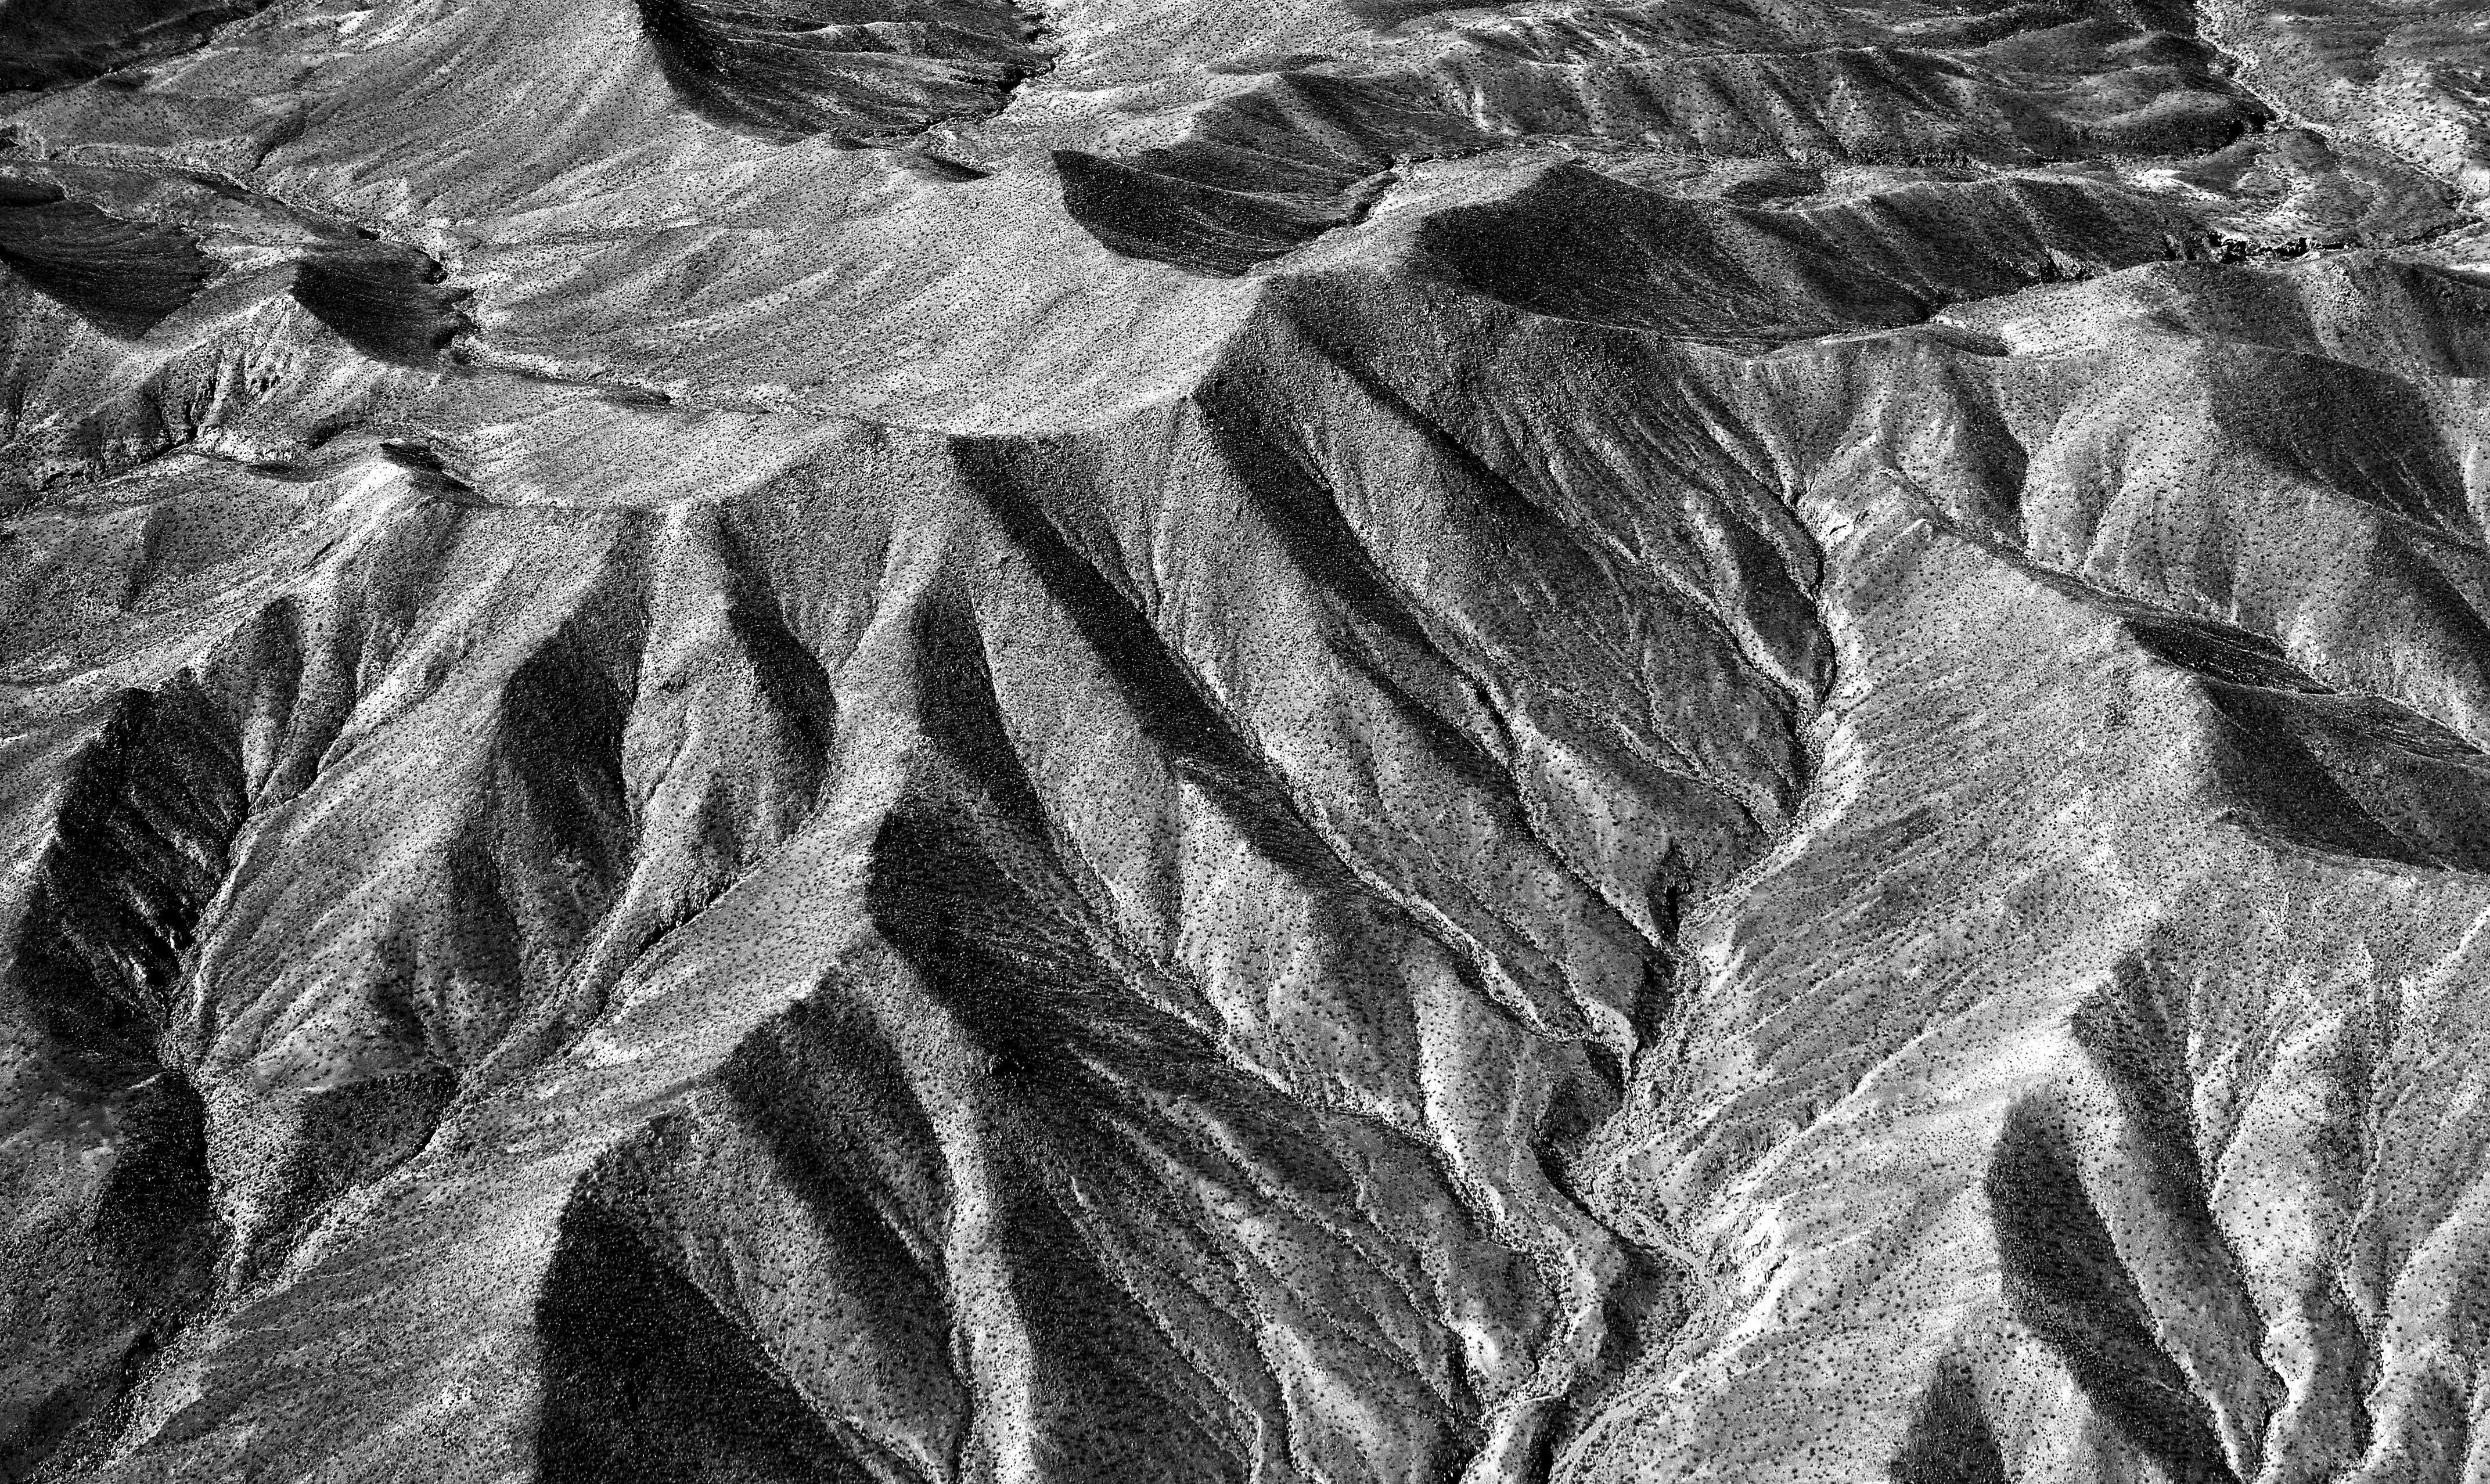 Towards Grand Canyon